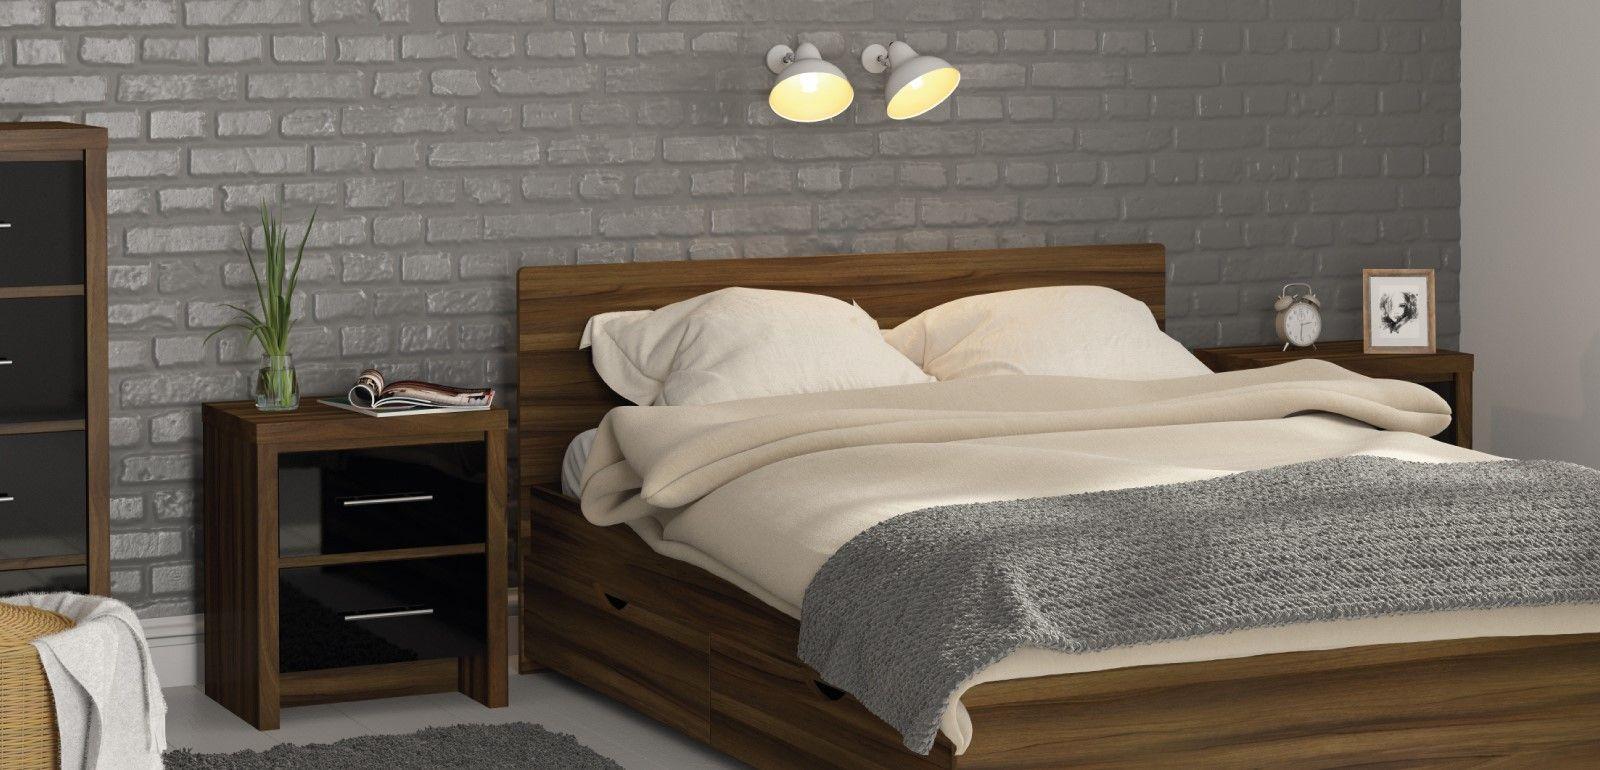 The No Nonsense Masculine Bedroom Guide